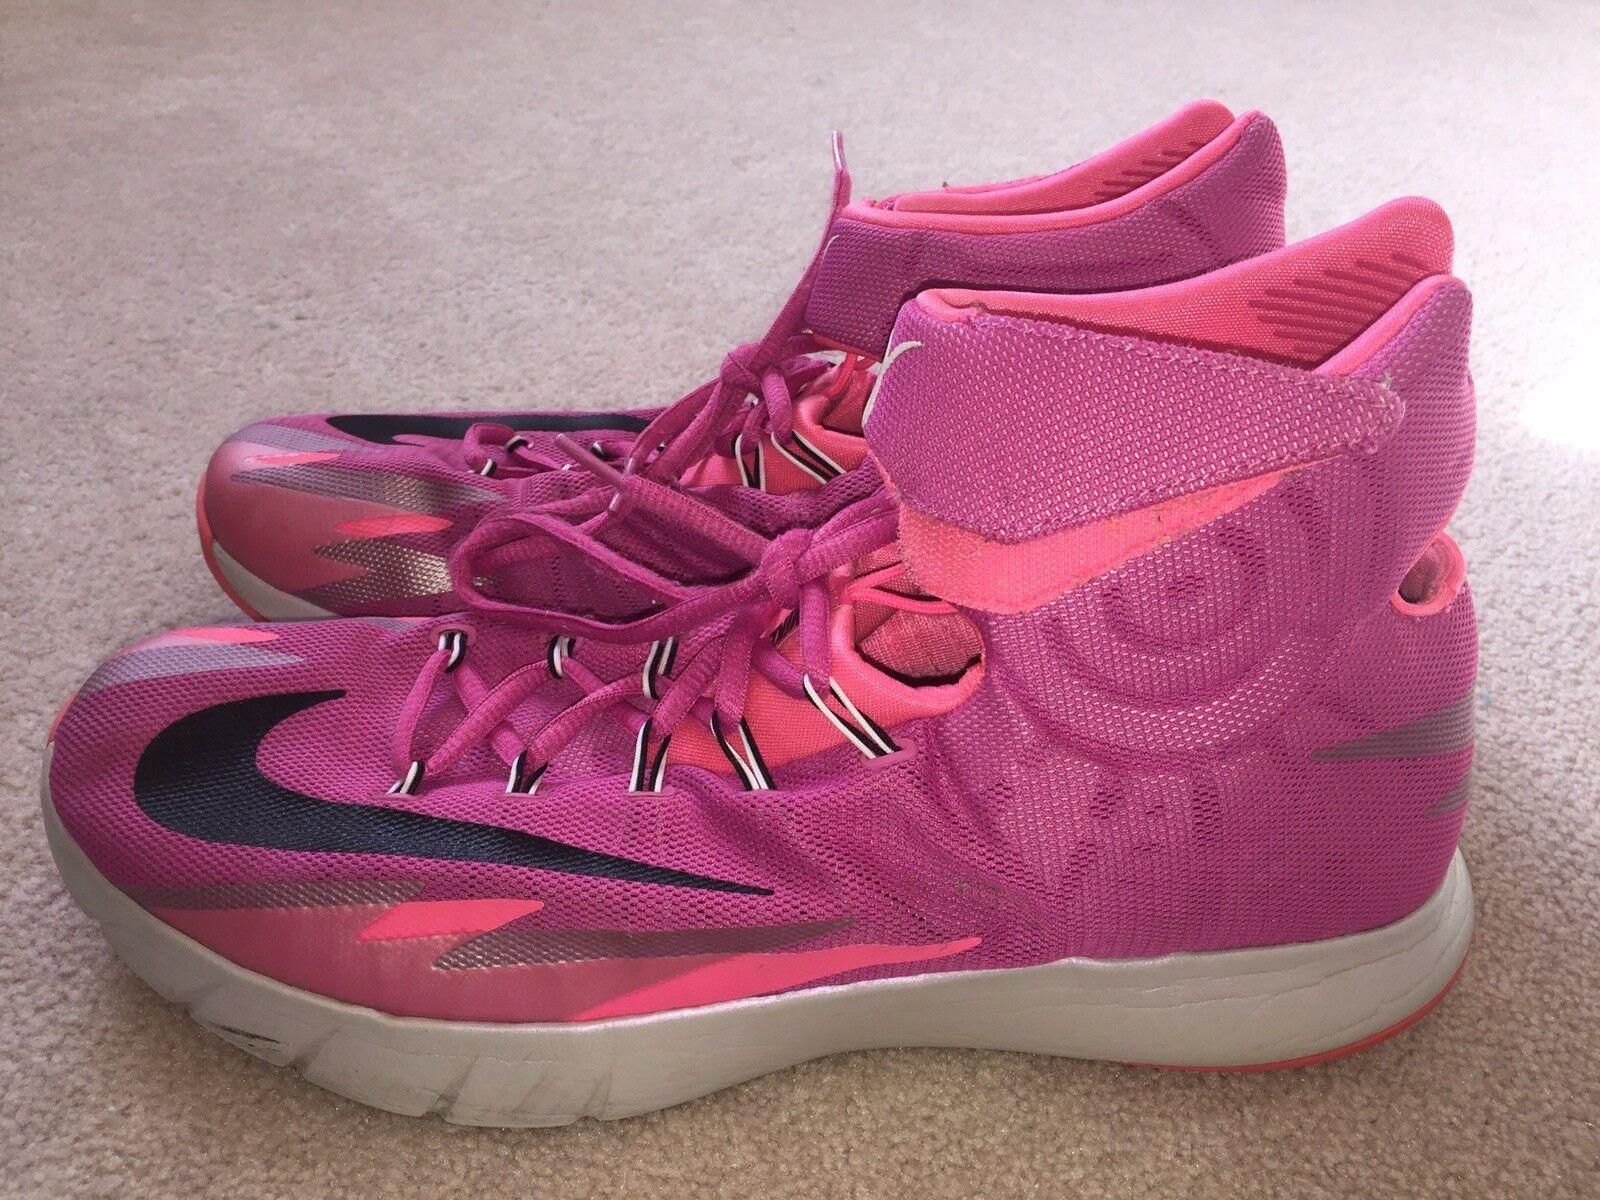 Mens nike basketball shoes Size 13